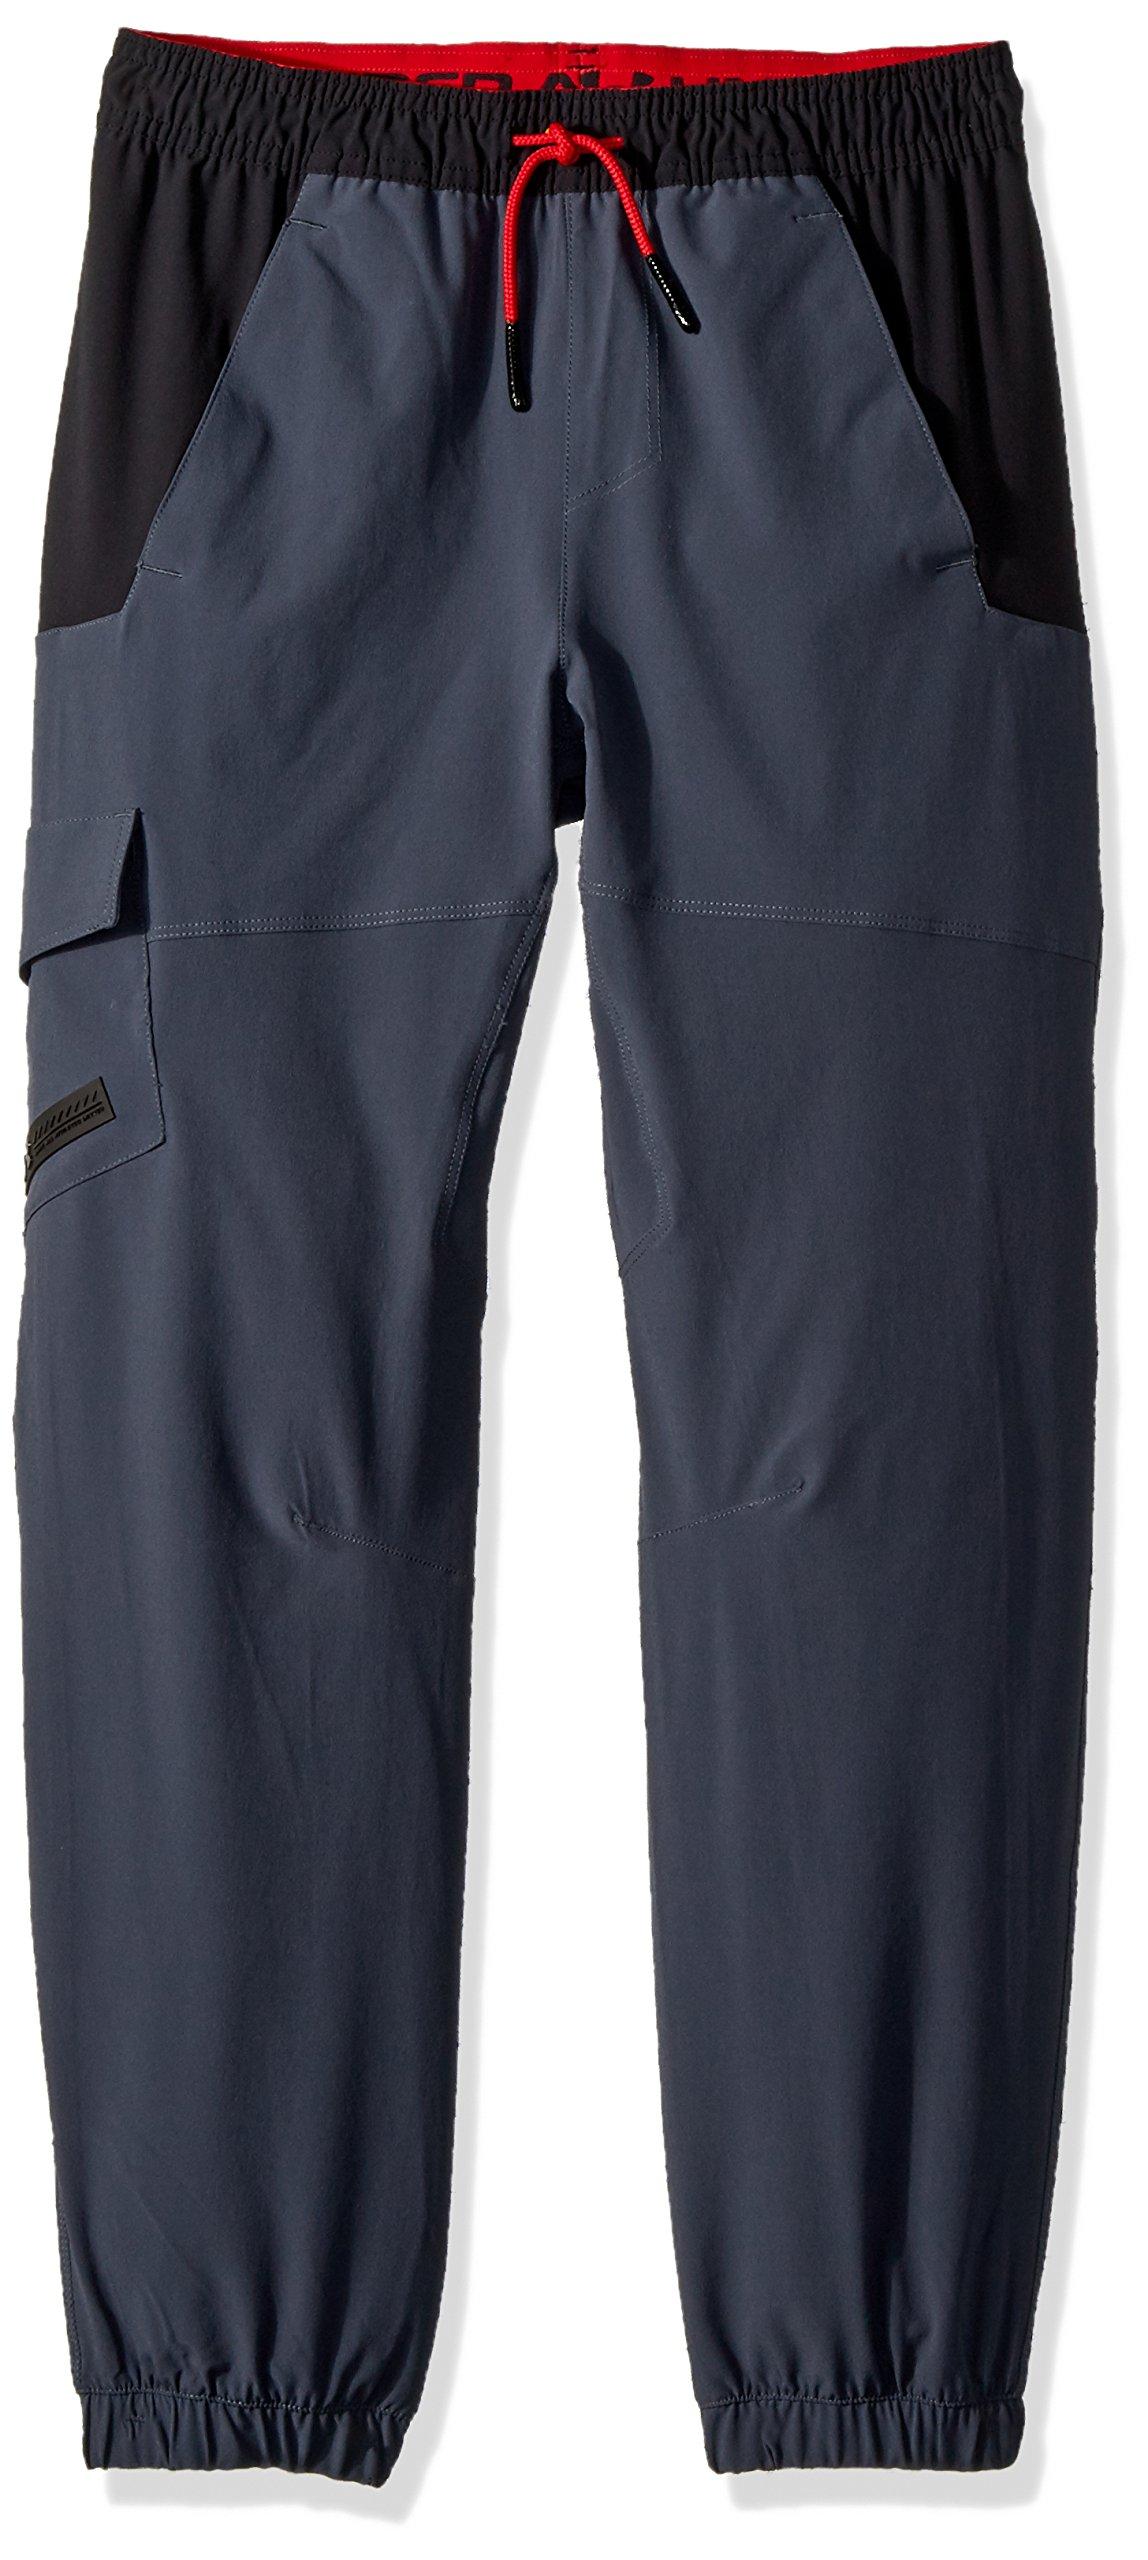 Under Armour Boys' X Level Cargo Pants, Stealth Gray (008)/Black, Youth Medium